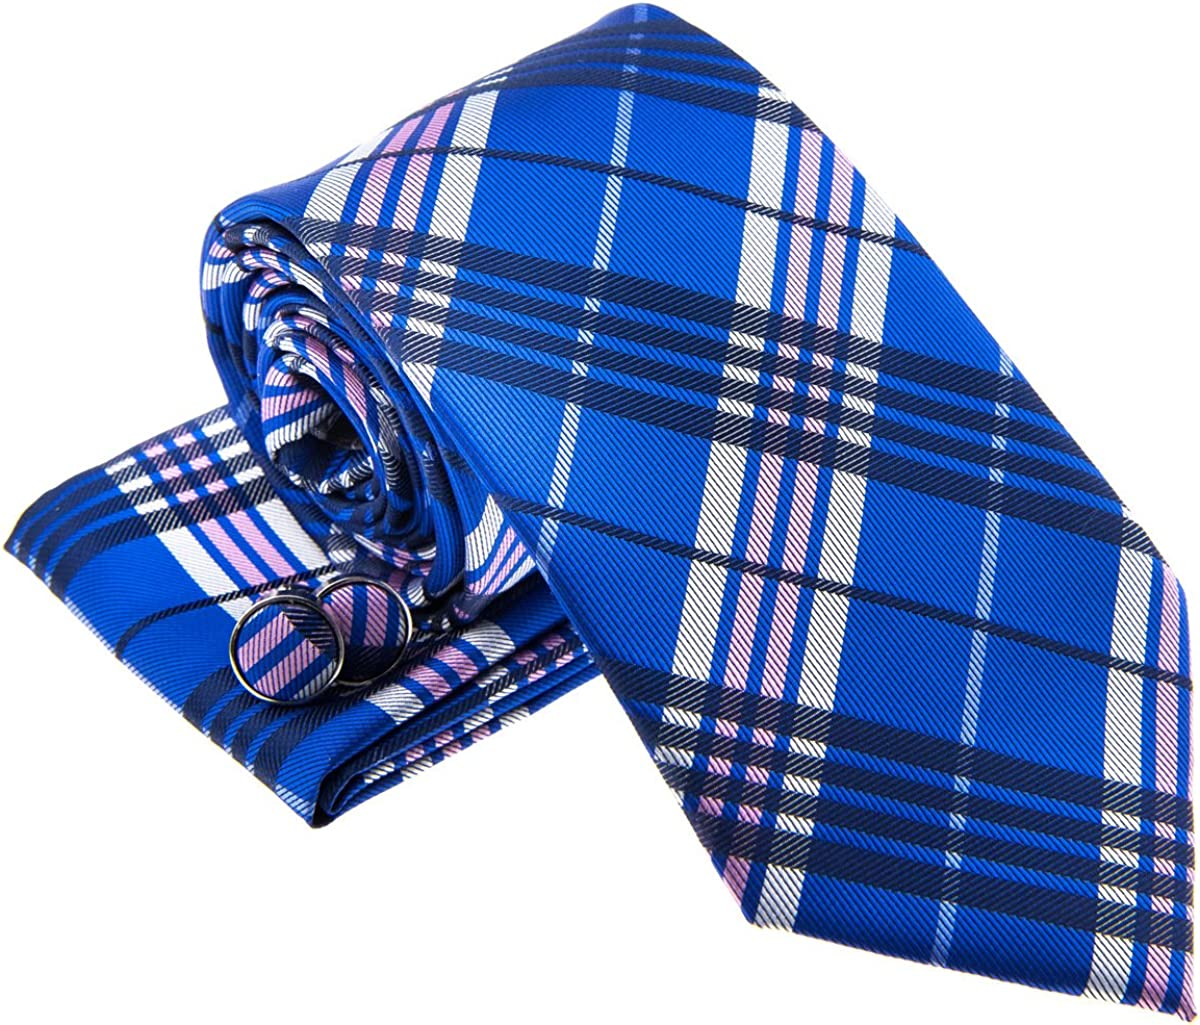 Stylish Tartan Plaid Check Woven Men's Tie Necktie w/Pocket Square & Cufflinks Gift Set